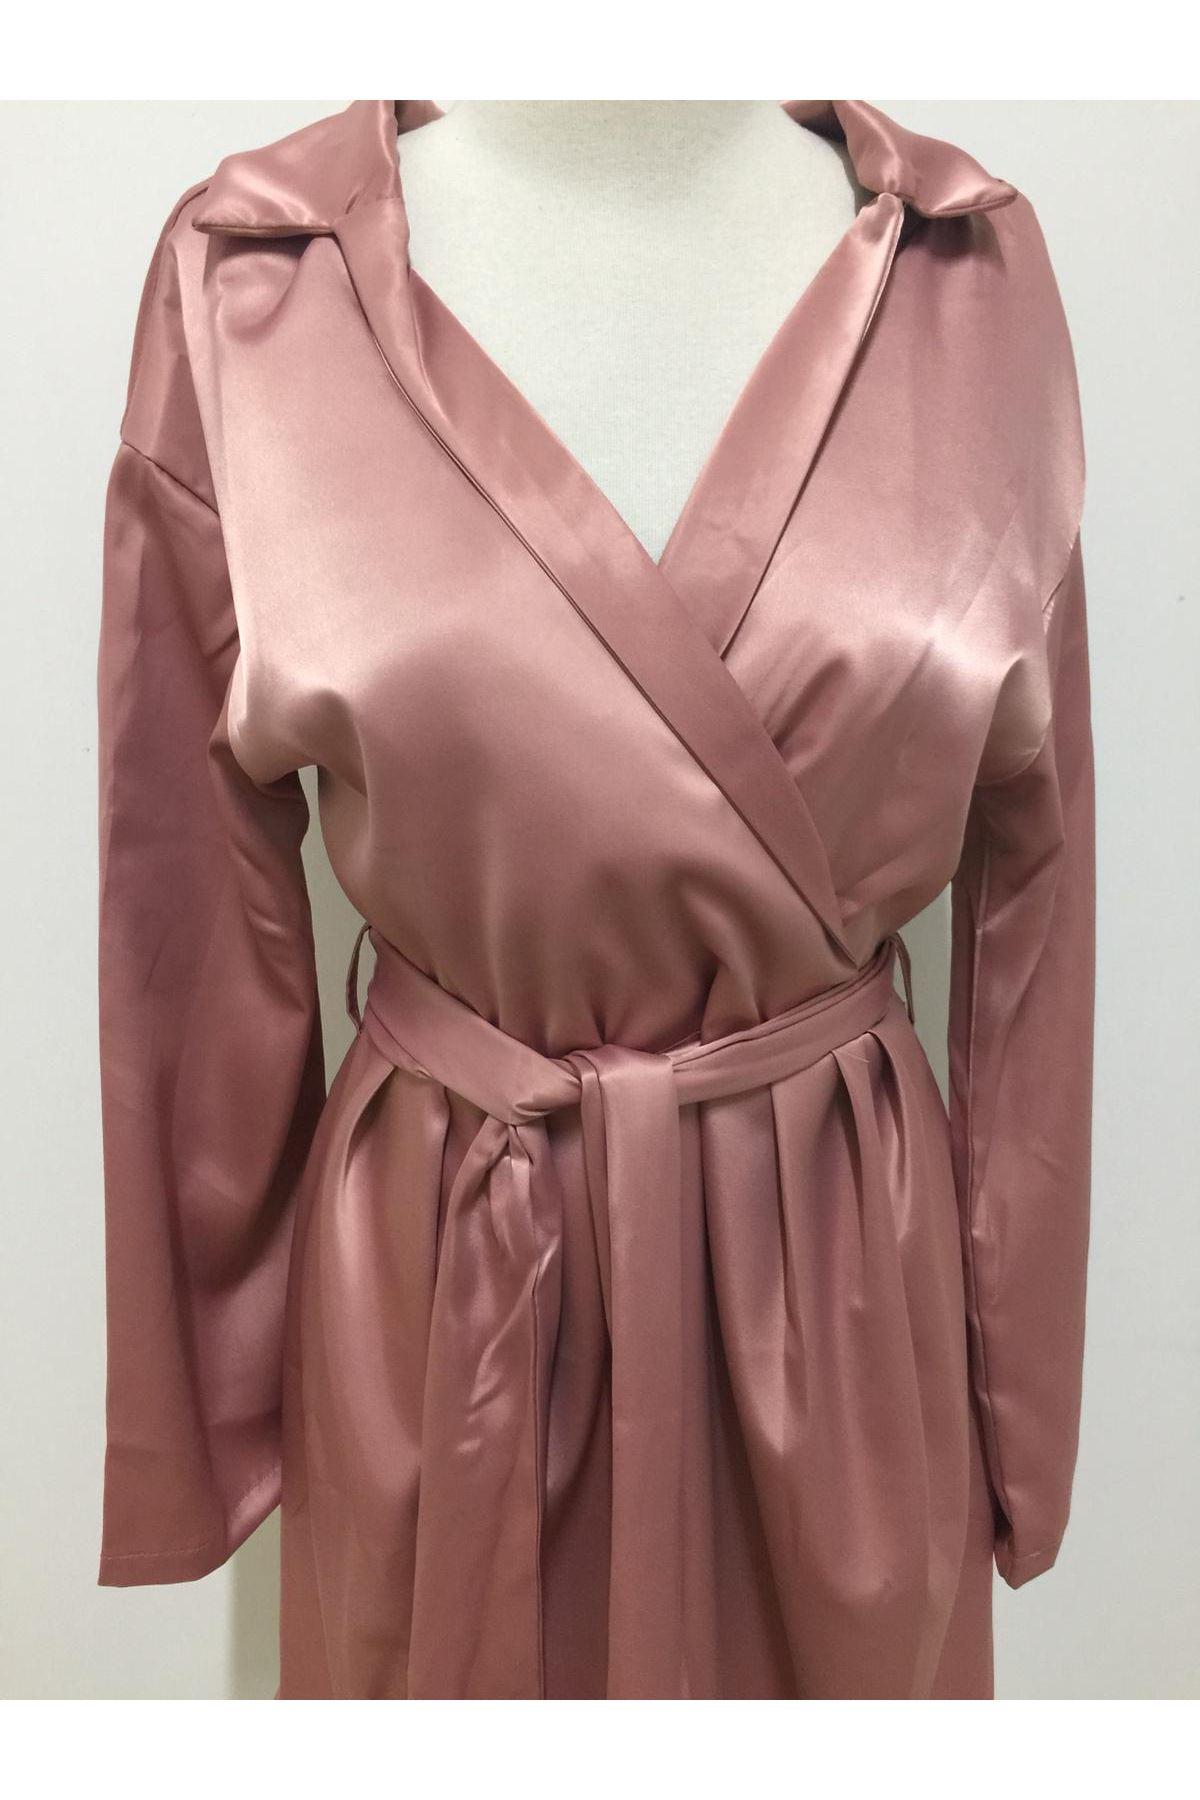 Fashion Düşük Omuz Saten Elbise - PEMBE